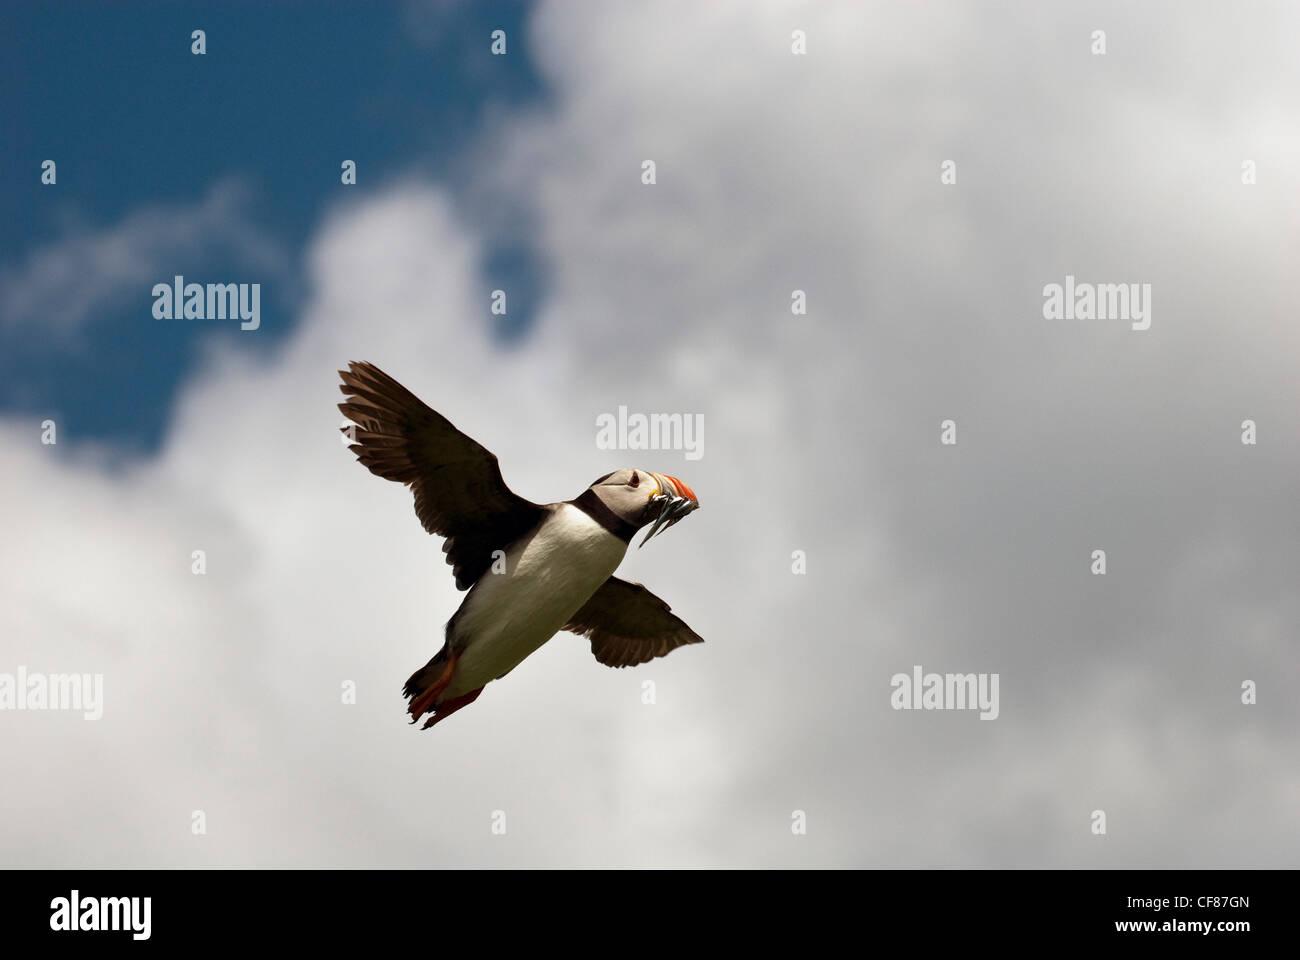 Puffin flying with fish in beak, Inner Farne Island, the Farne Islands, UK Stock Photo